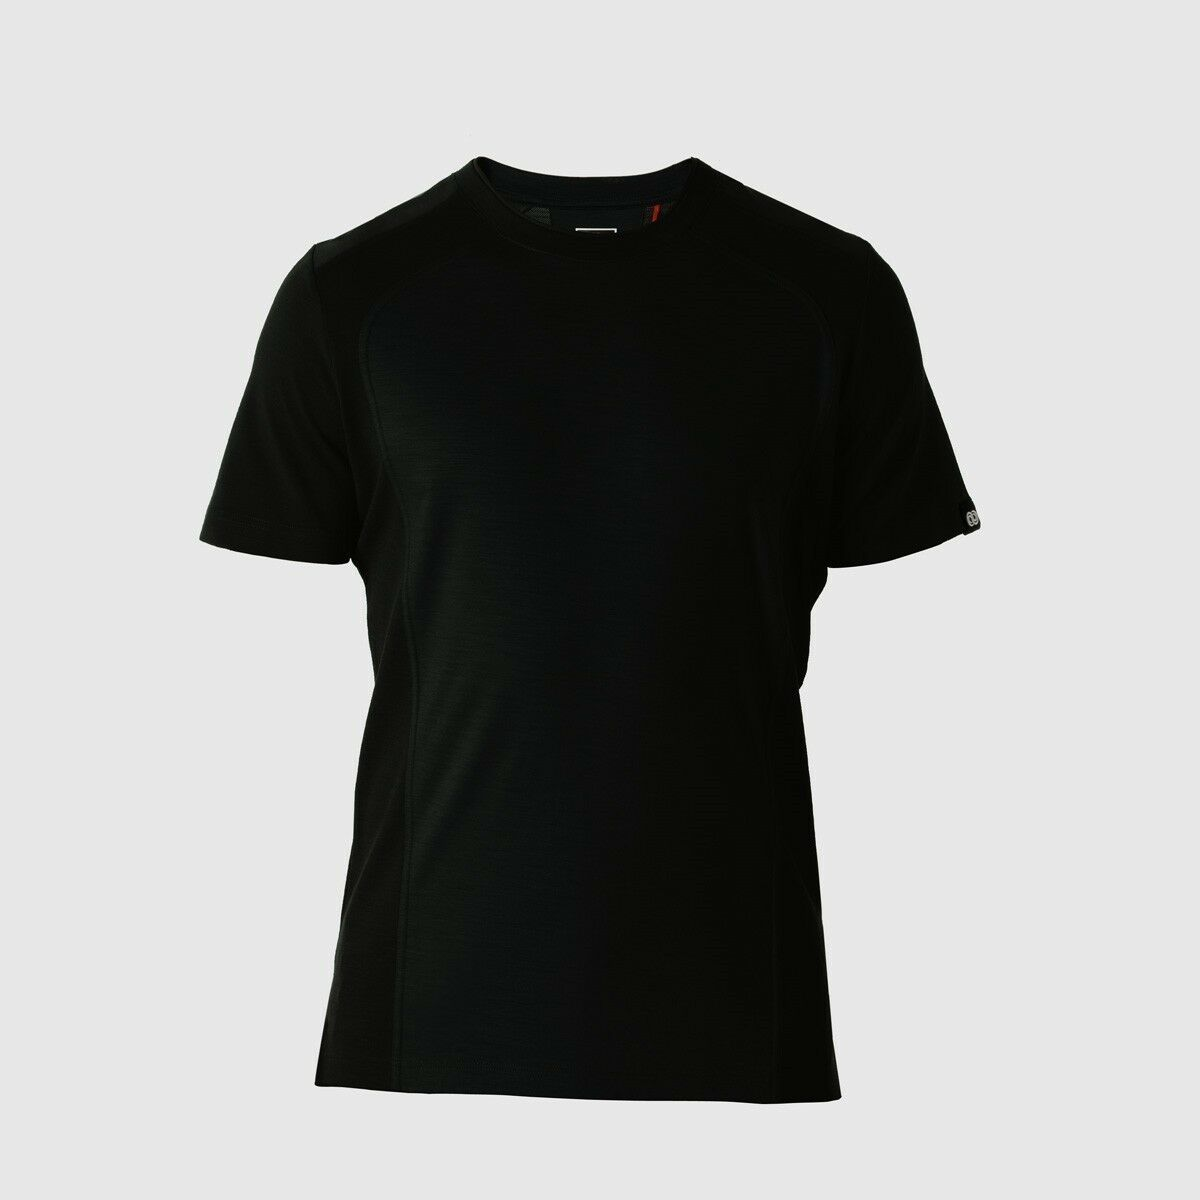 REDA Rewoolution Trip - Mens T-Shirt Short Sleeve 140, night, Merinowolle